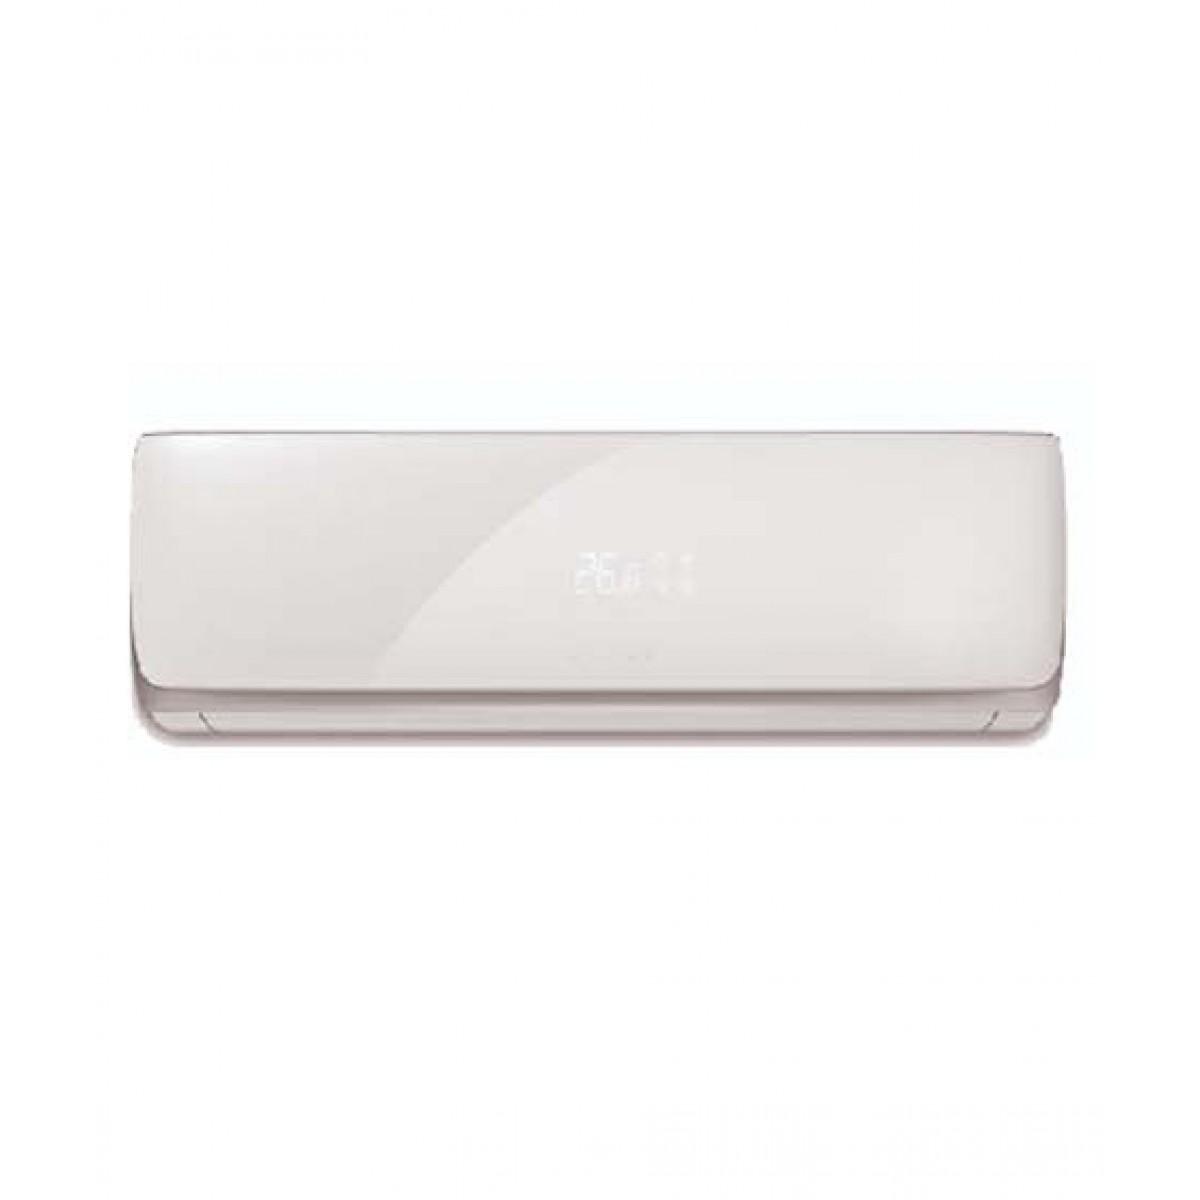 Changhong Ruba Inverter Split Air Conditioner 1.0 Ton (CSDC-12BAH+)